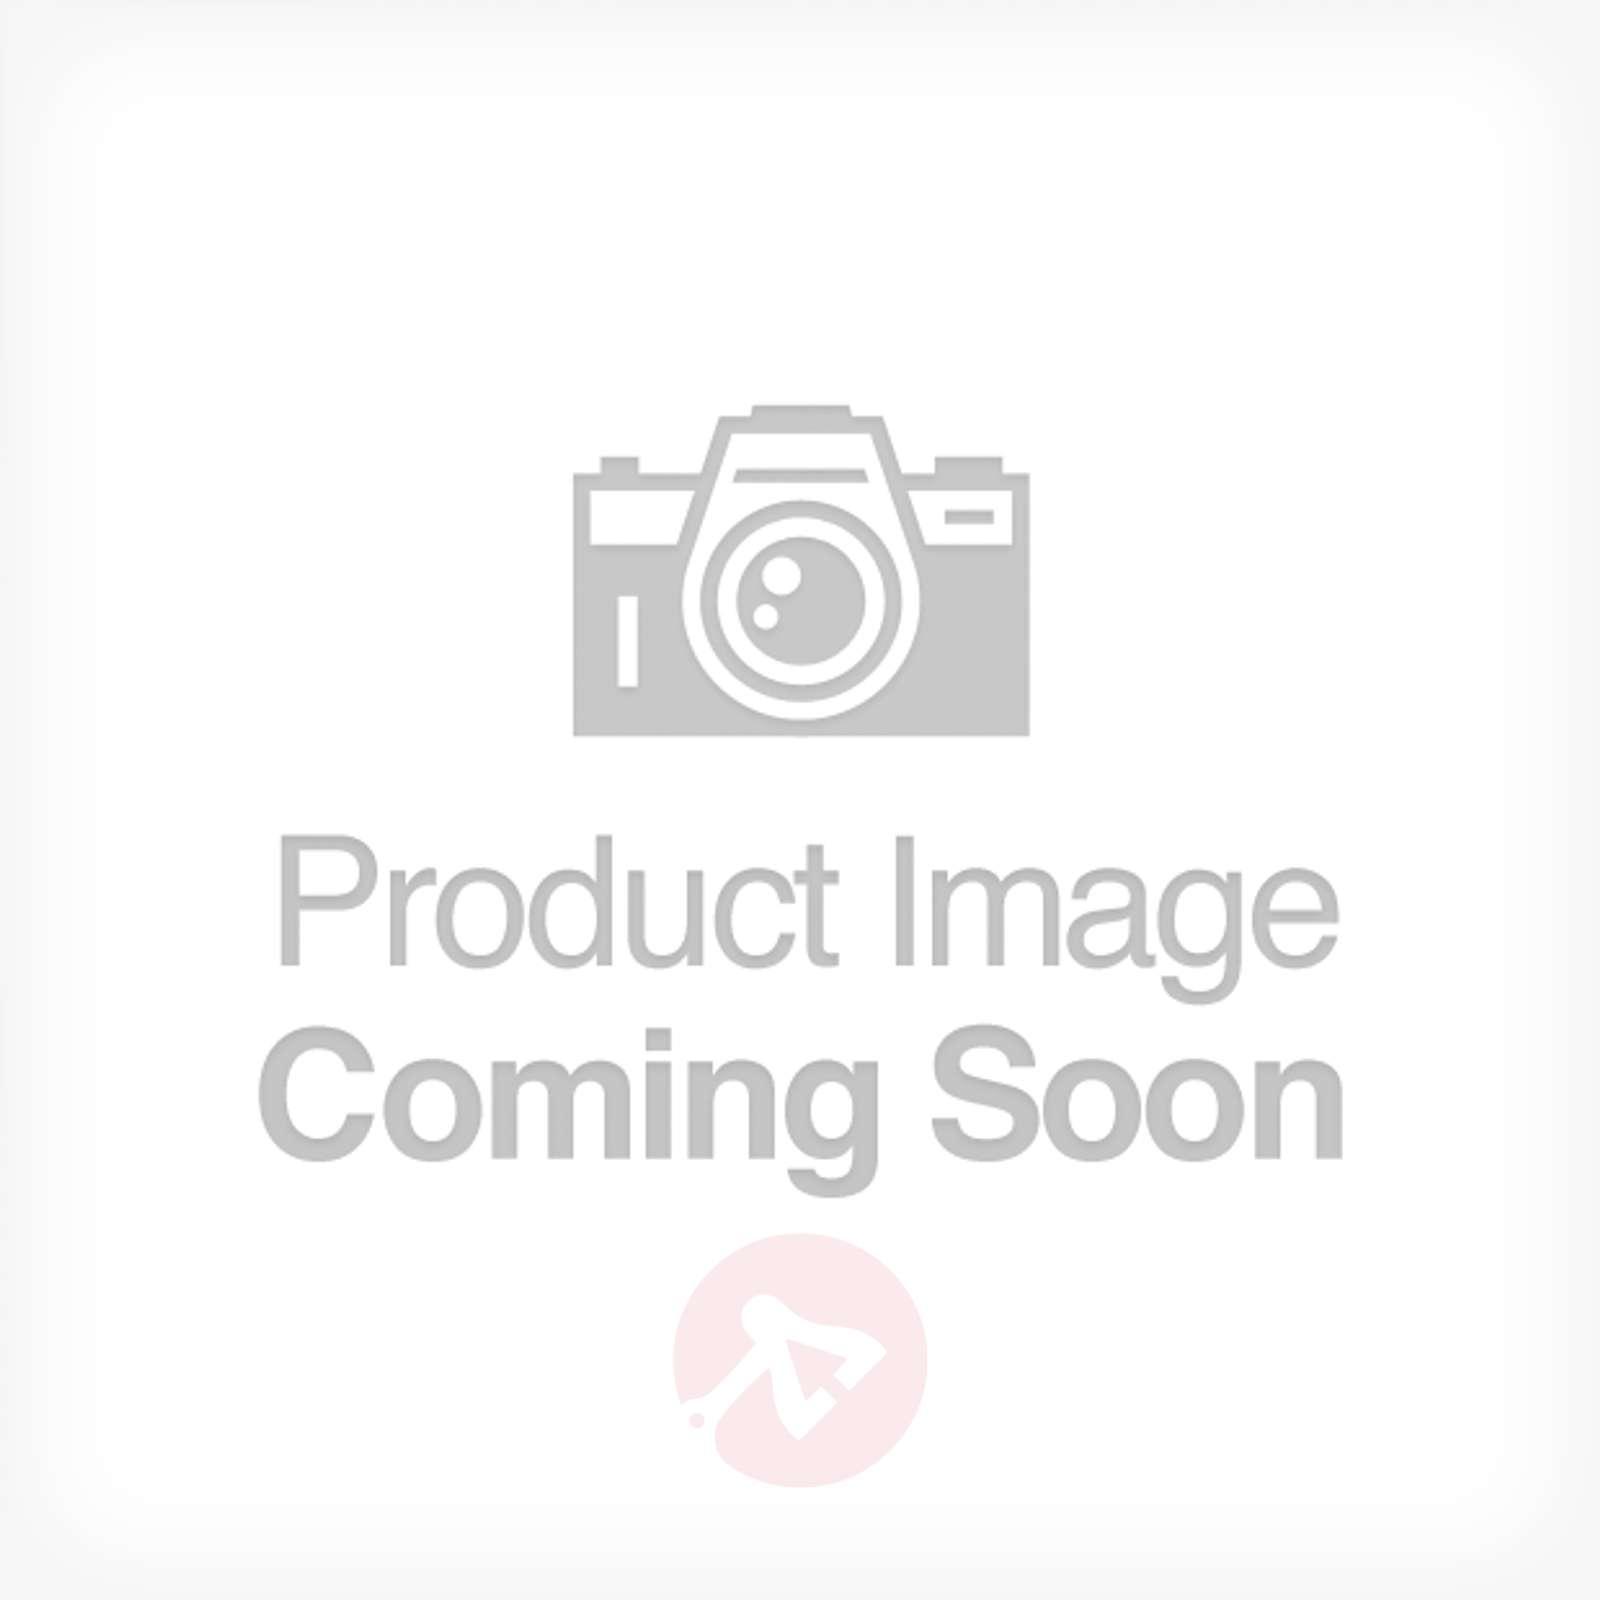 Peili FLAIR integroidulla valaistuksella-1020056-02